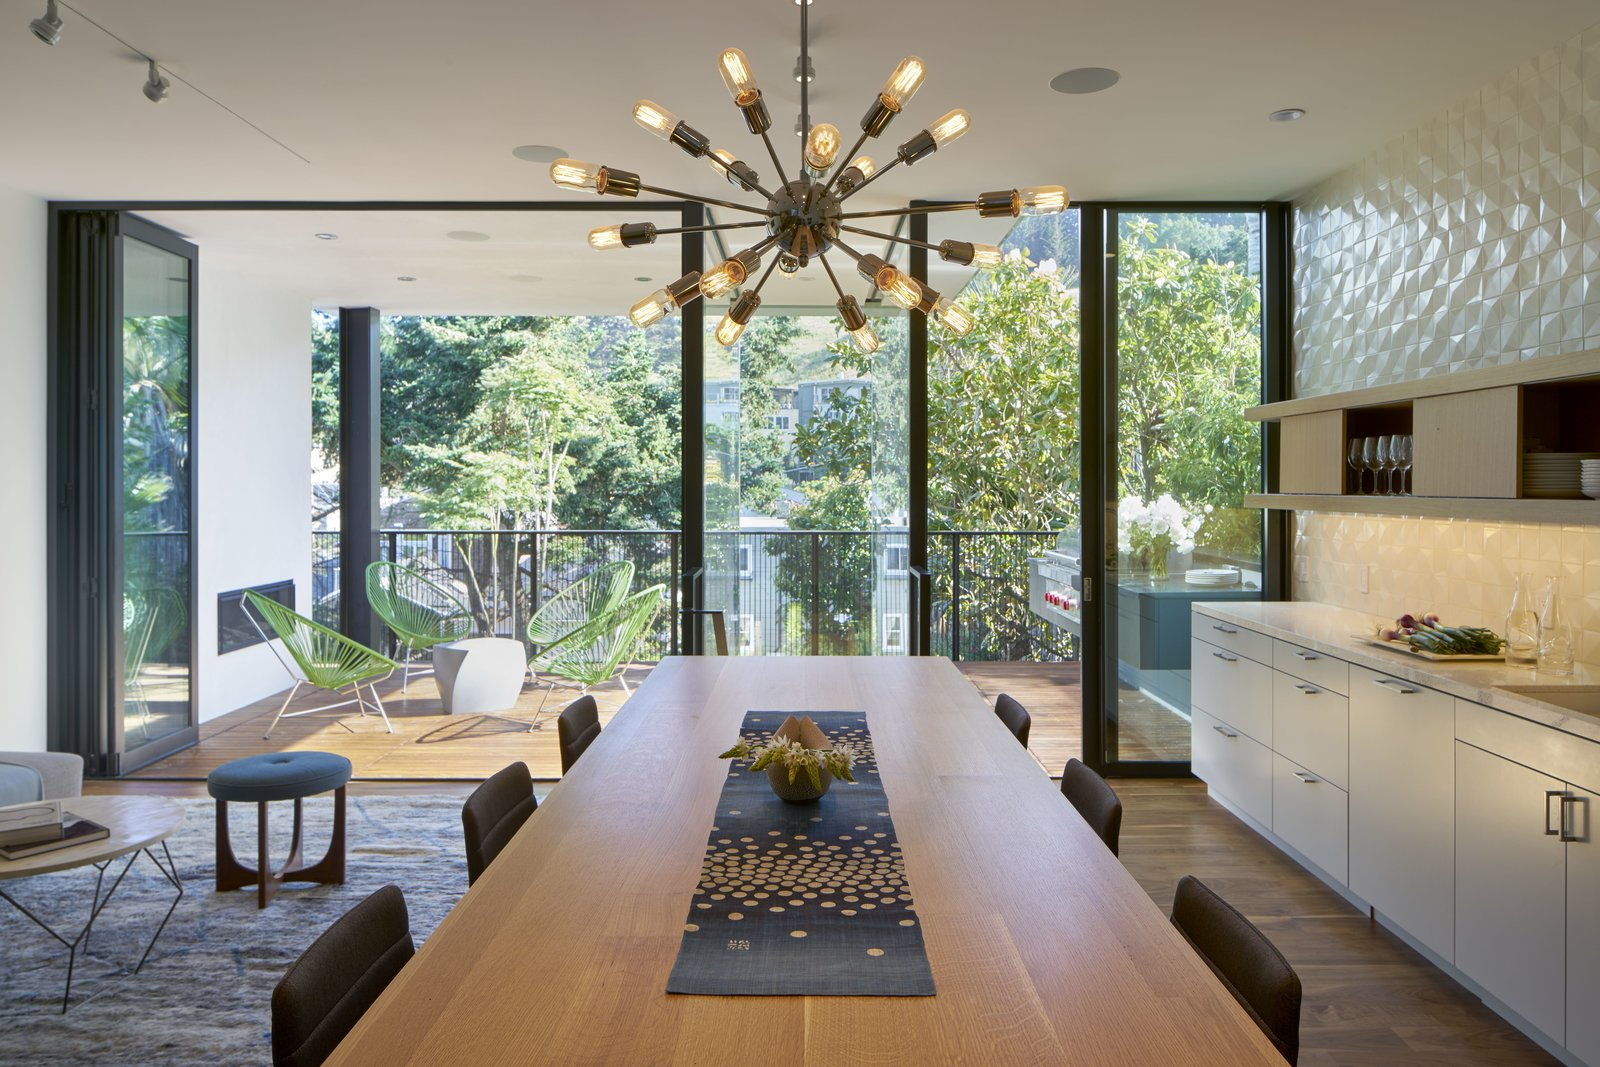 Dining Room, Light Hardwood Floor, and Dark Hardwood Floor  29th Street Residence by Schwartz and Architecture